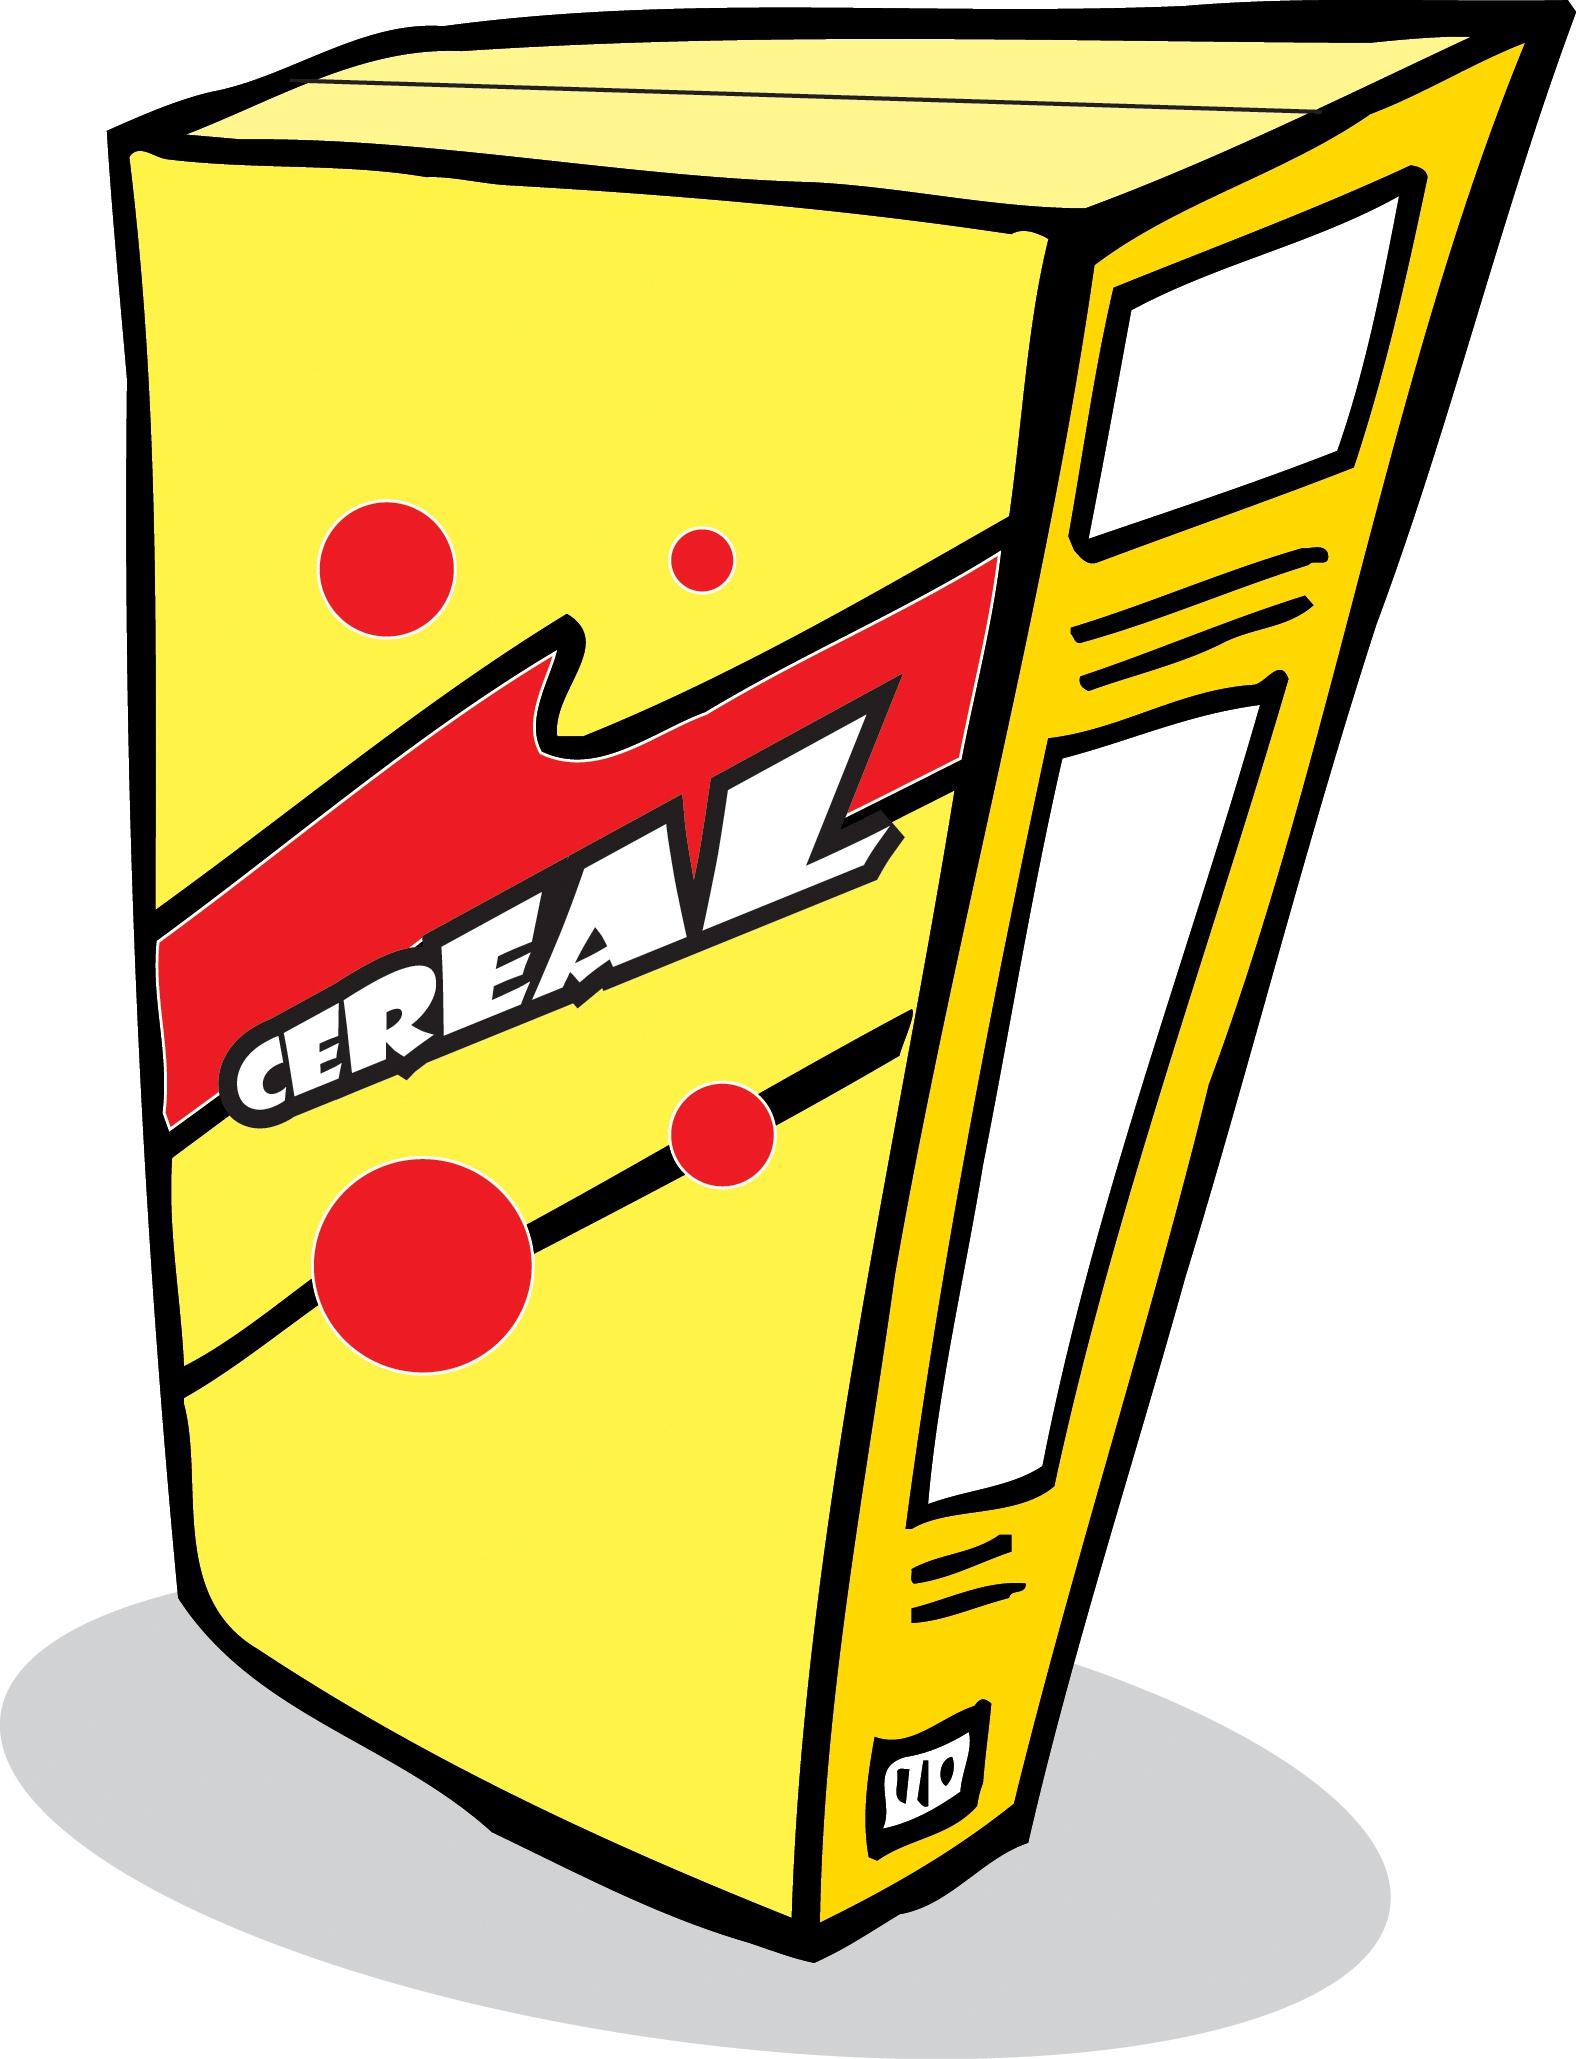 Cheerios Cereal Box Clipart#2083690.